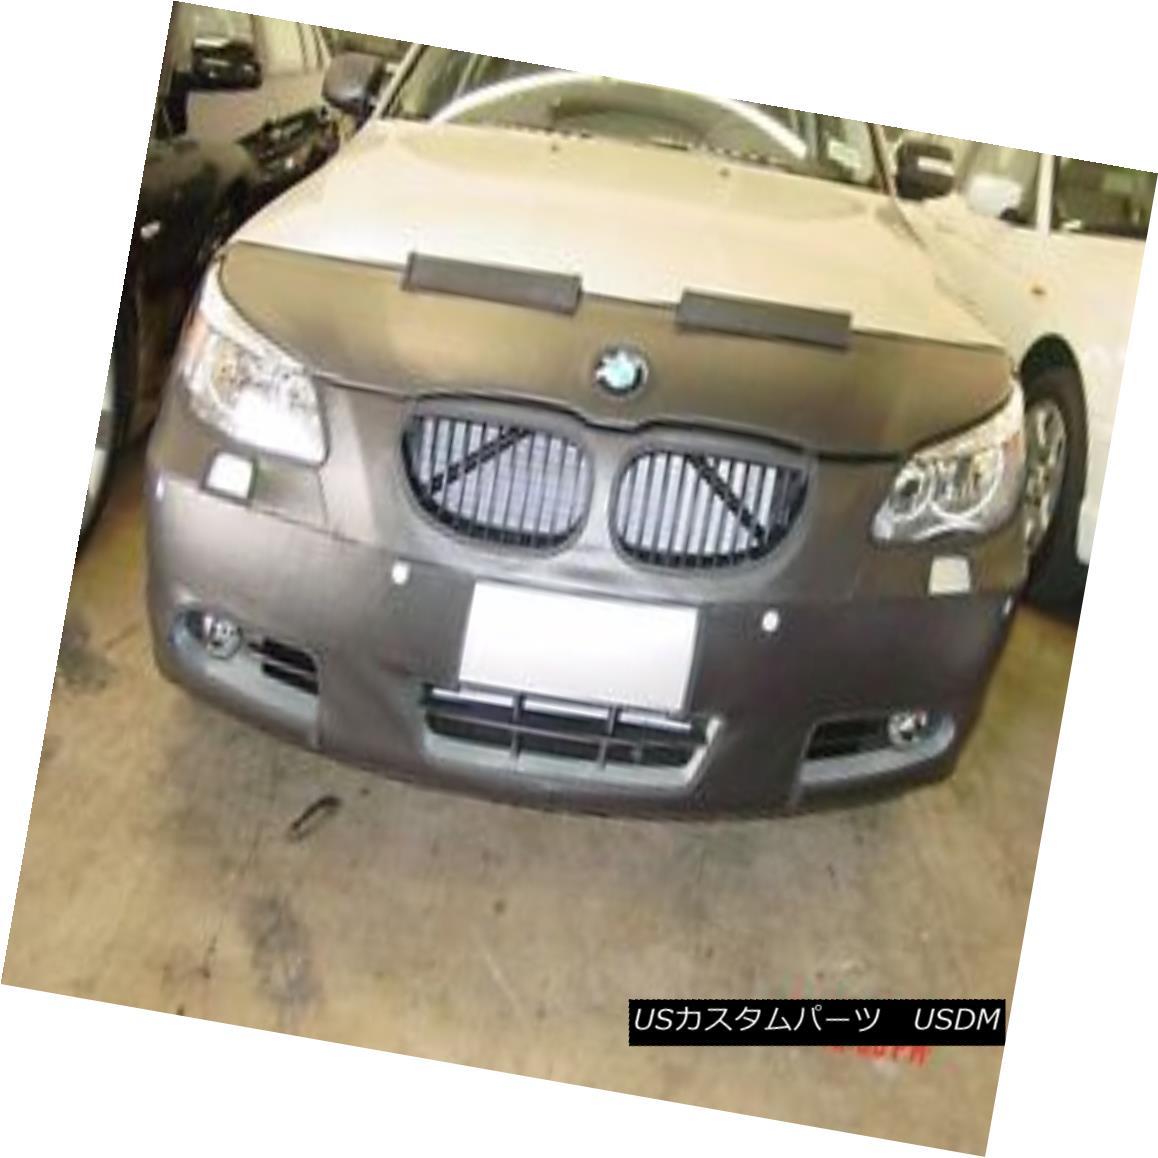 Colgan Front End Mask Bra 2pc.Fits BMW 525i 530i 545i 550i 01-03 W//O License